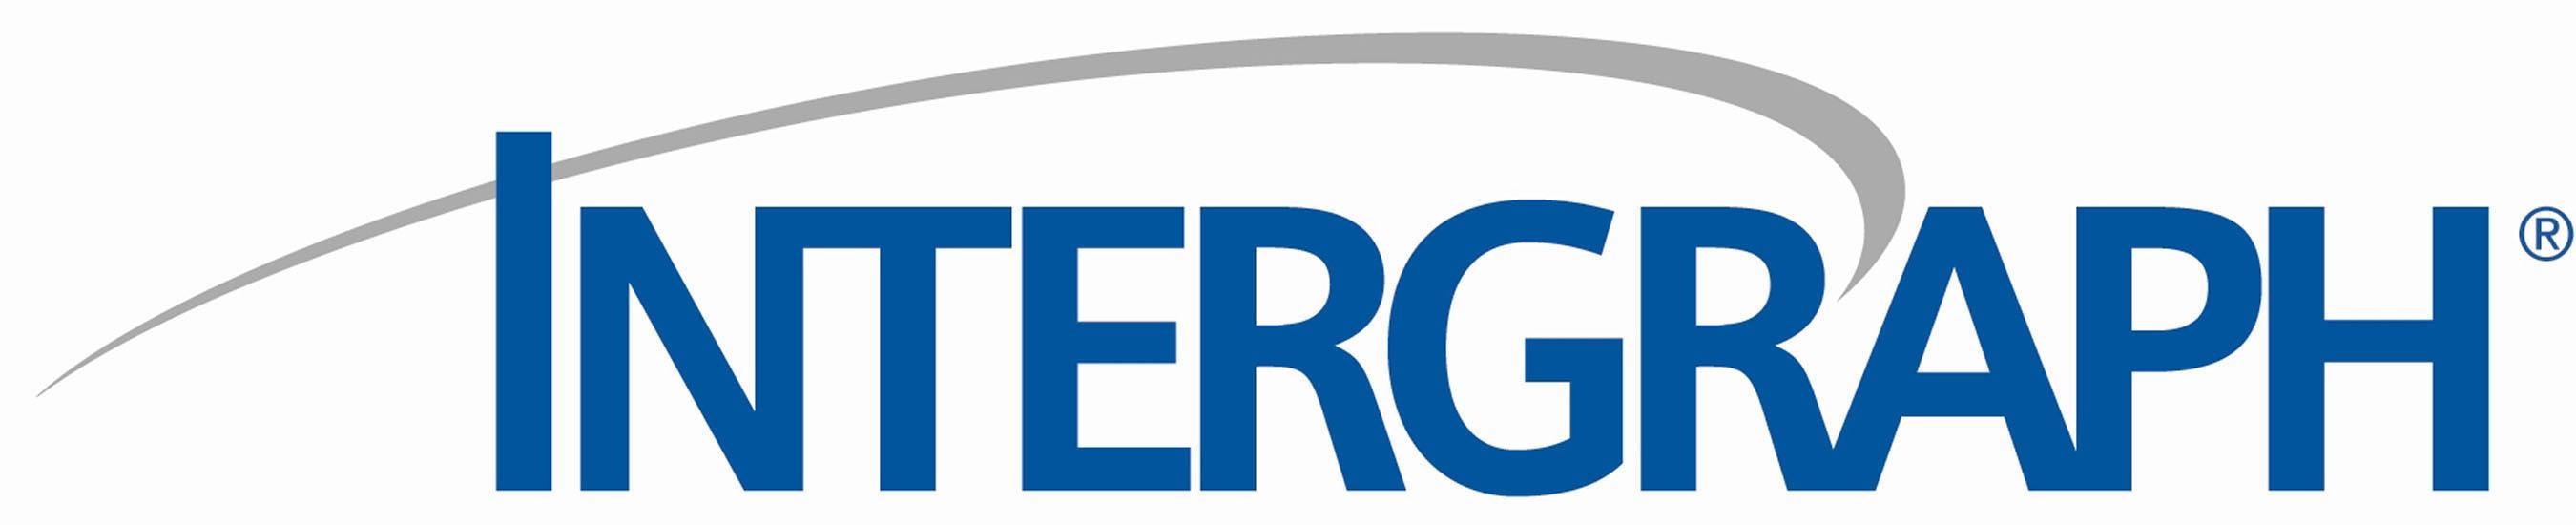 Intergraph logo.